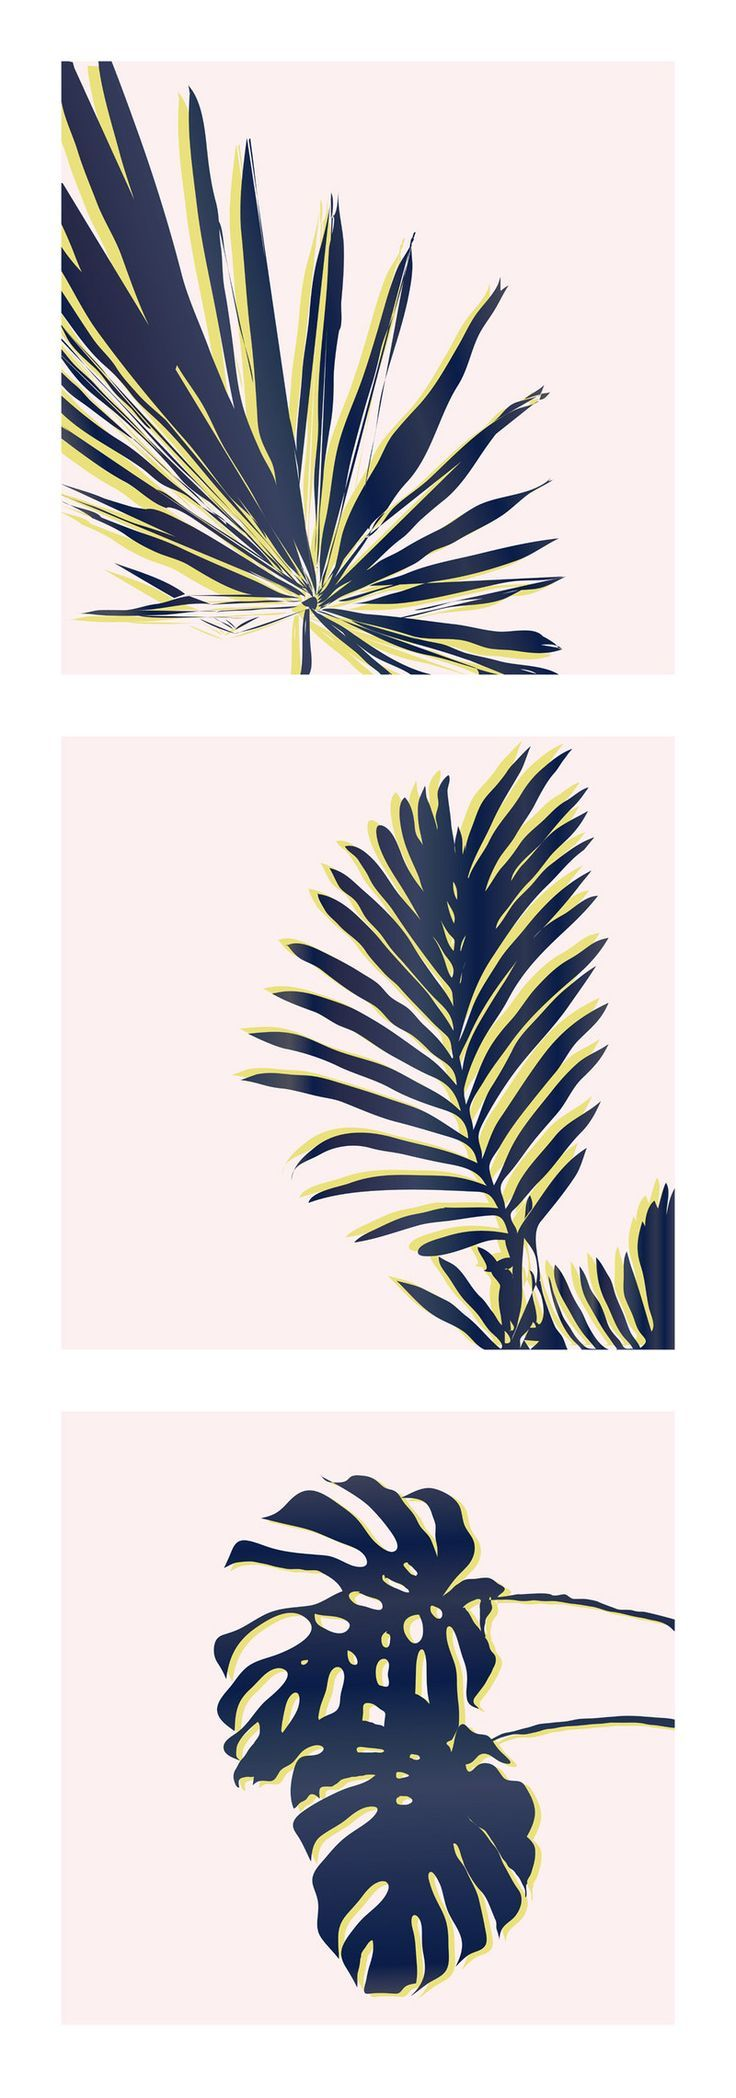 Palm Spring Triptych - Palm Study by Minted Artist Cindy C. Lackey